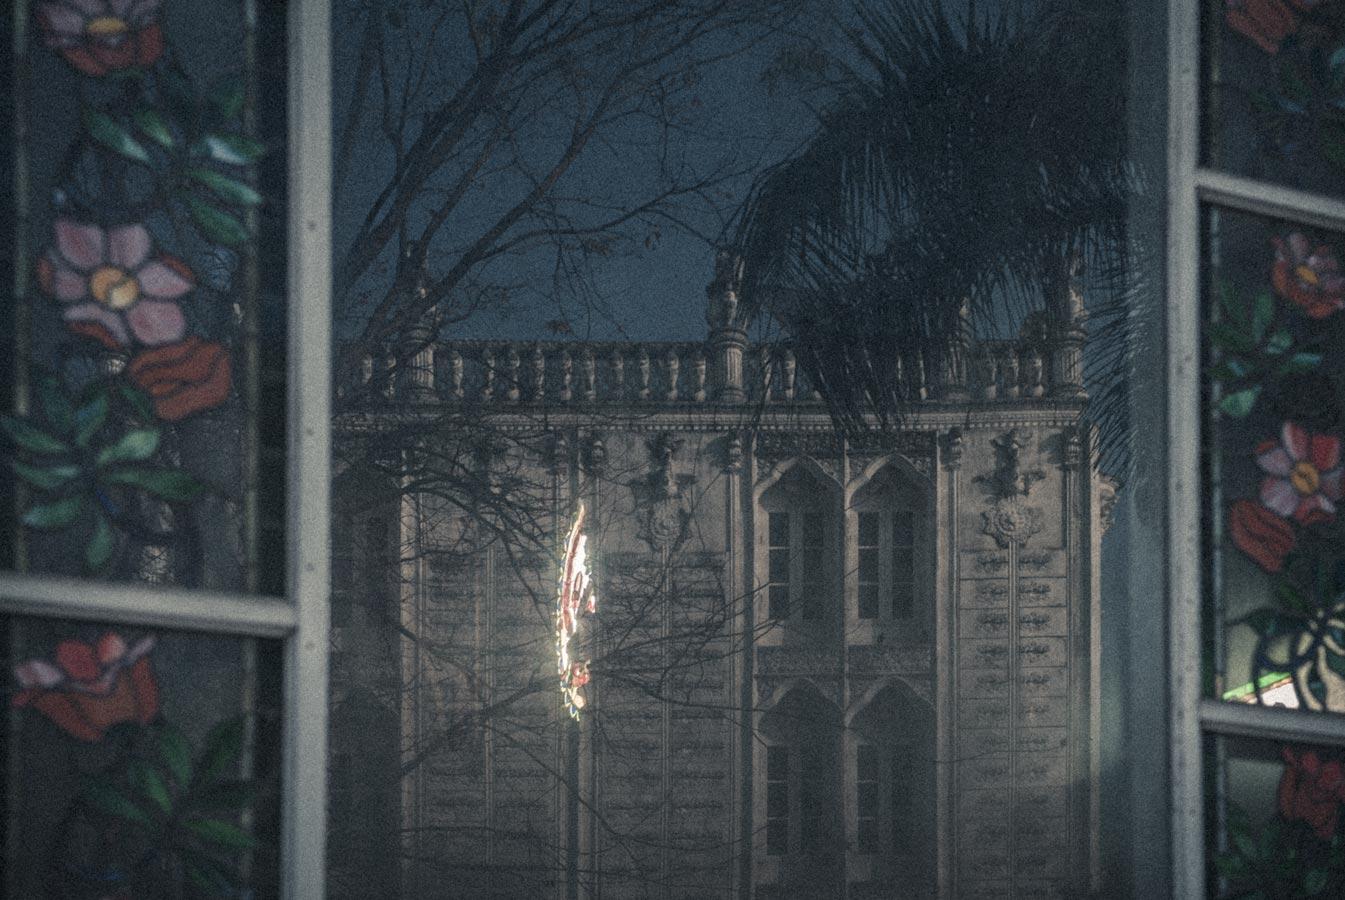 Jamie-Lowe-Photography-Haunted-House-Chiang-Mai-4-2.jpg